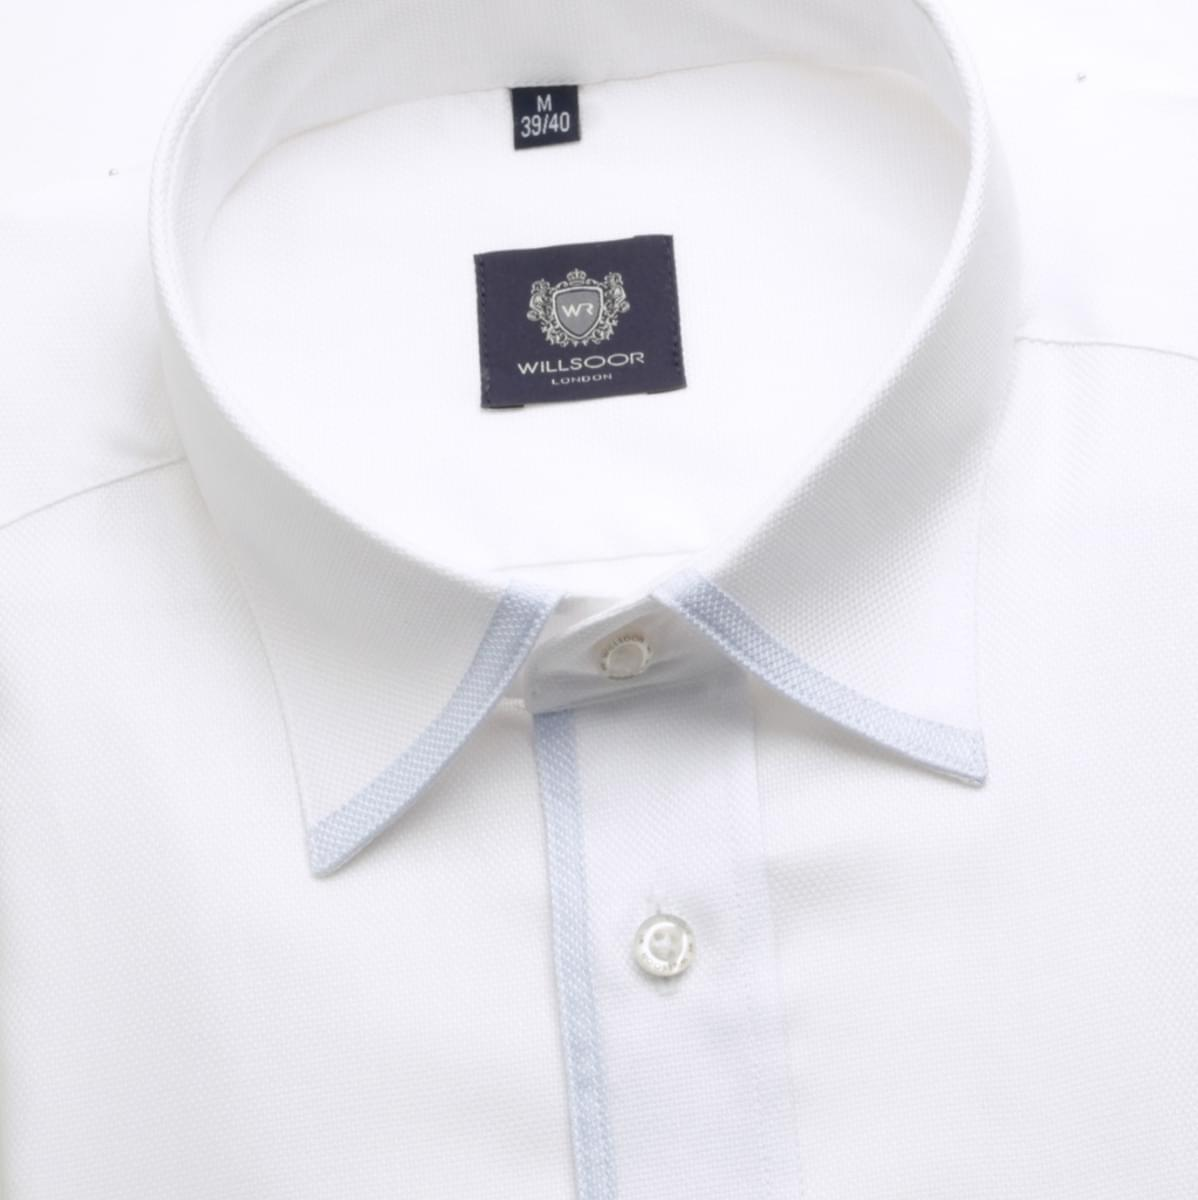 Willsoor Pánská košile WR London (výška 176-182) 1975 176-182 / L (41/42)